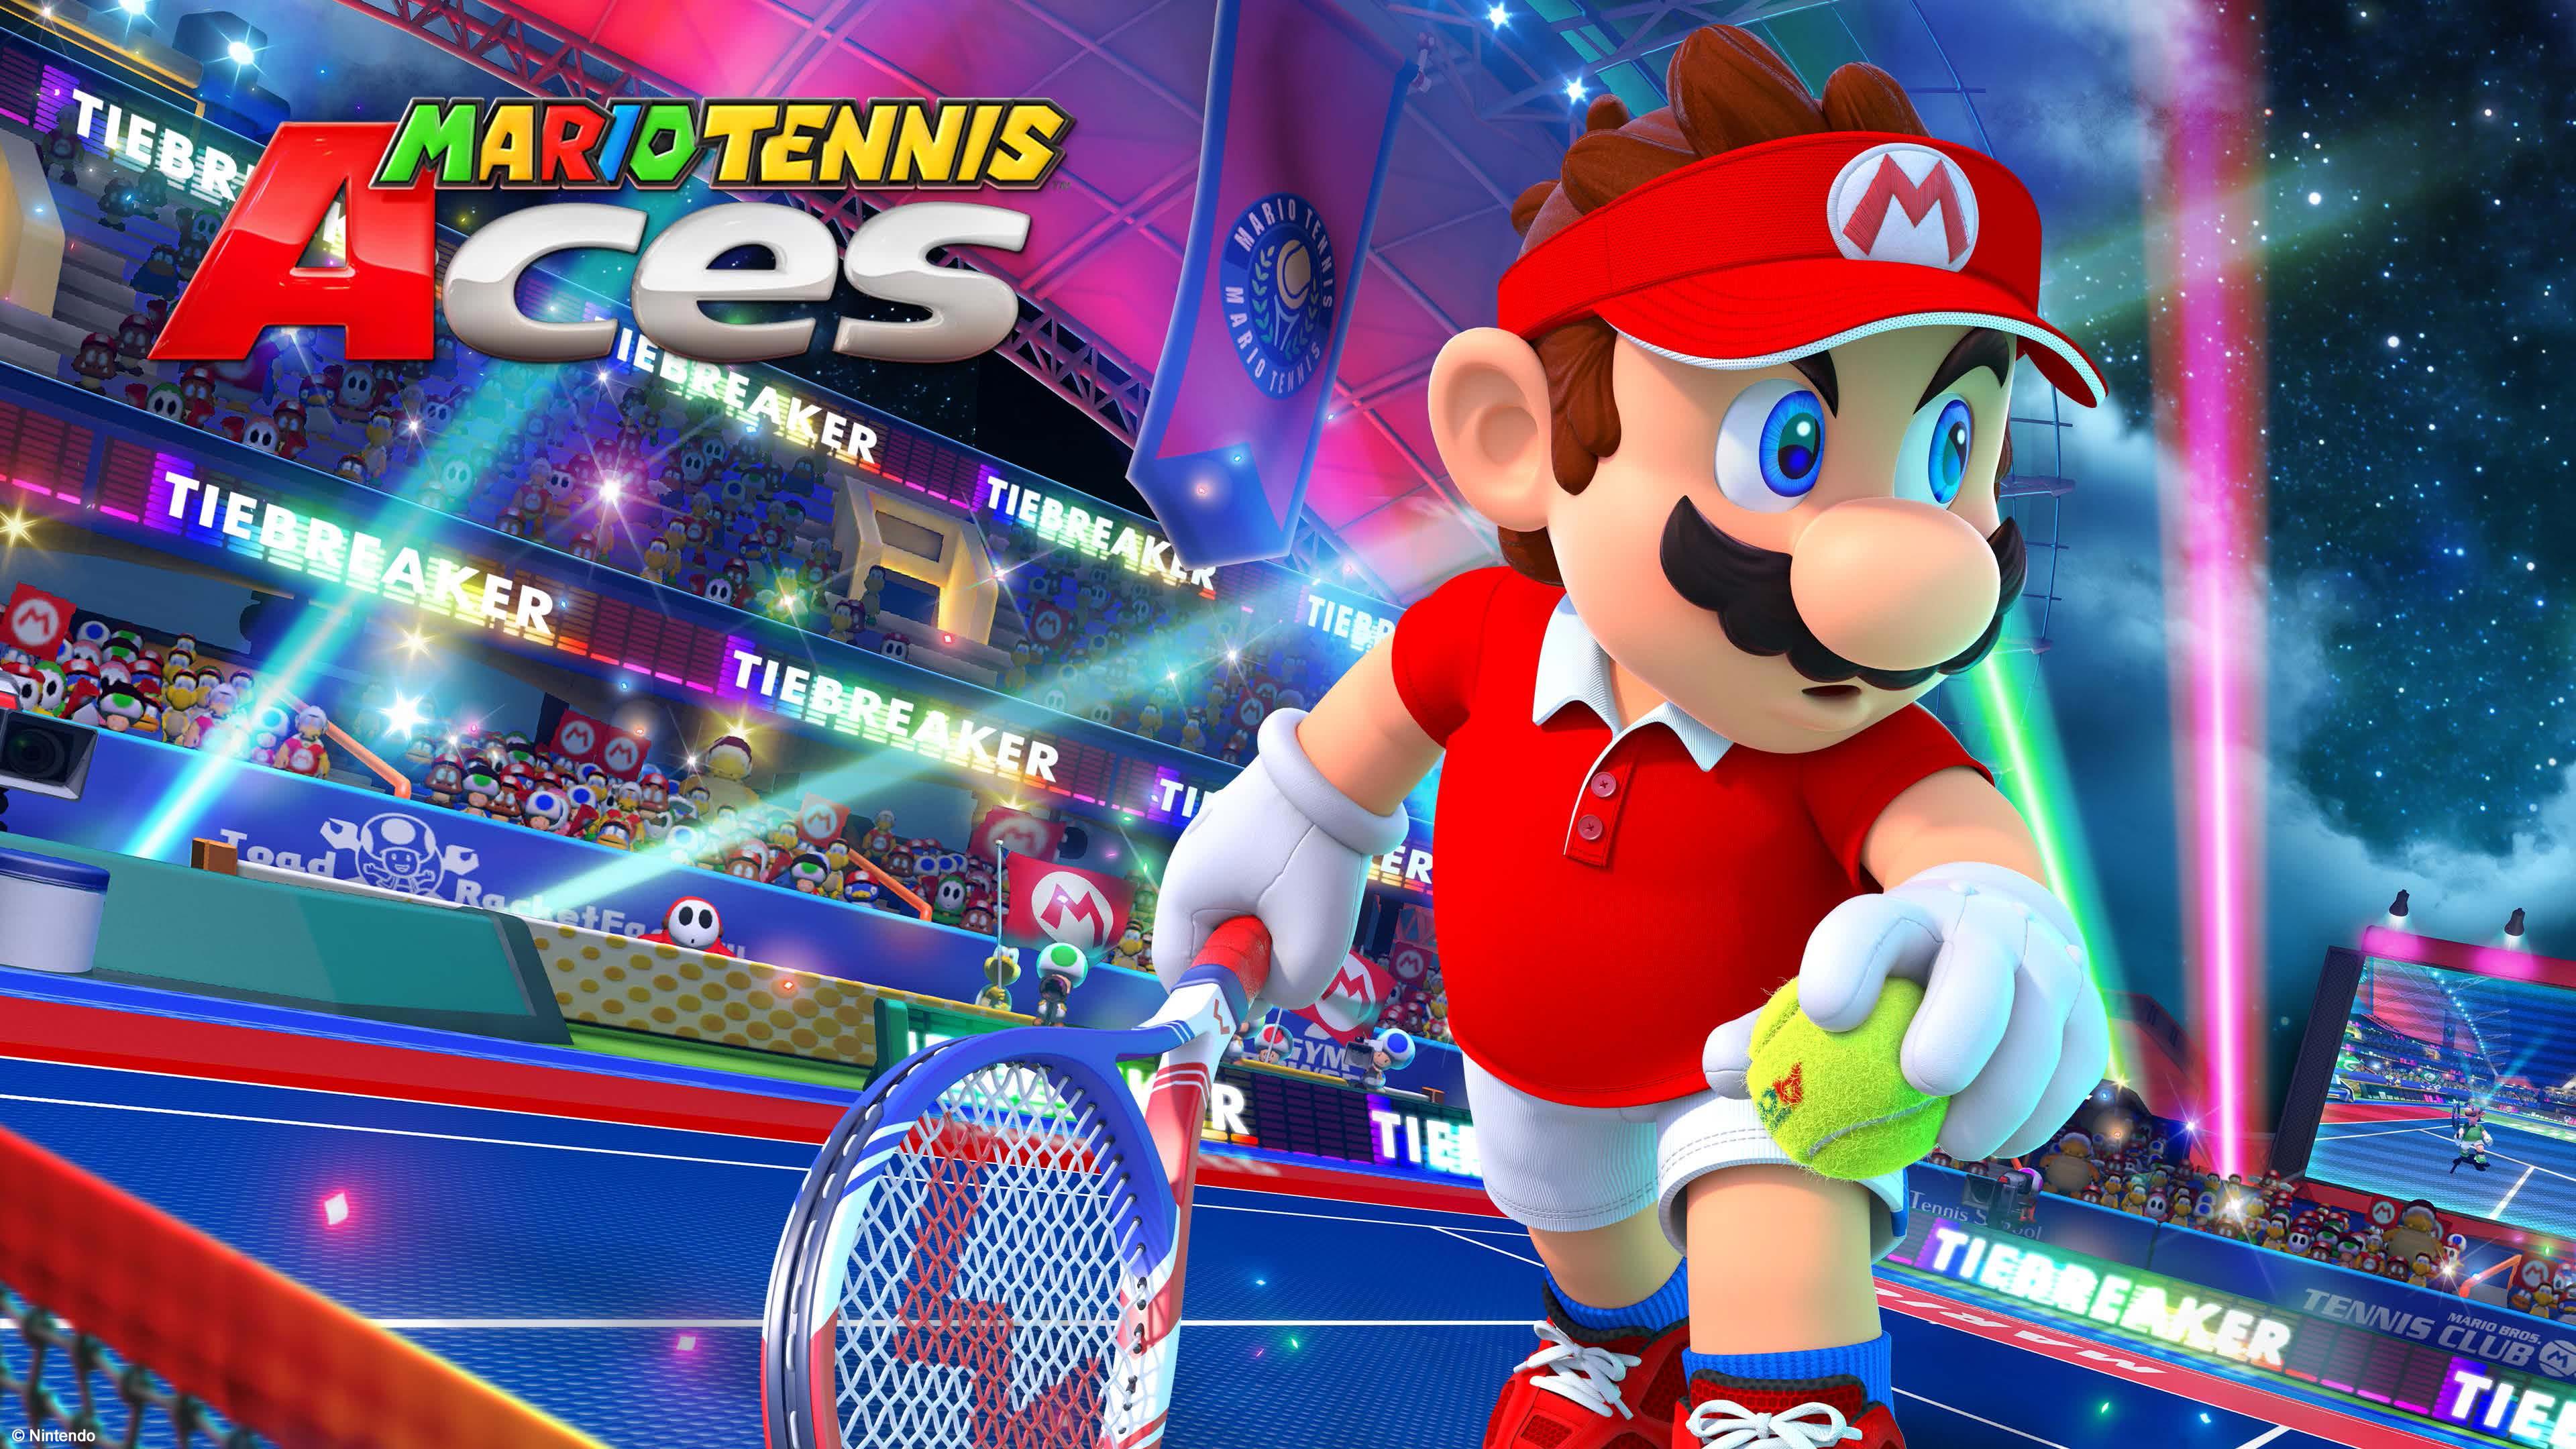 mario tennis aces uhd 4k wallpaper